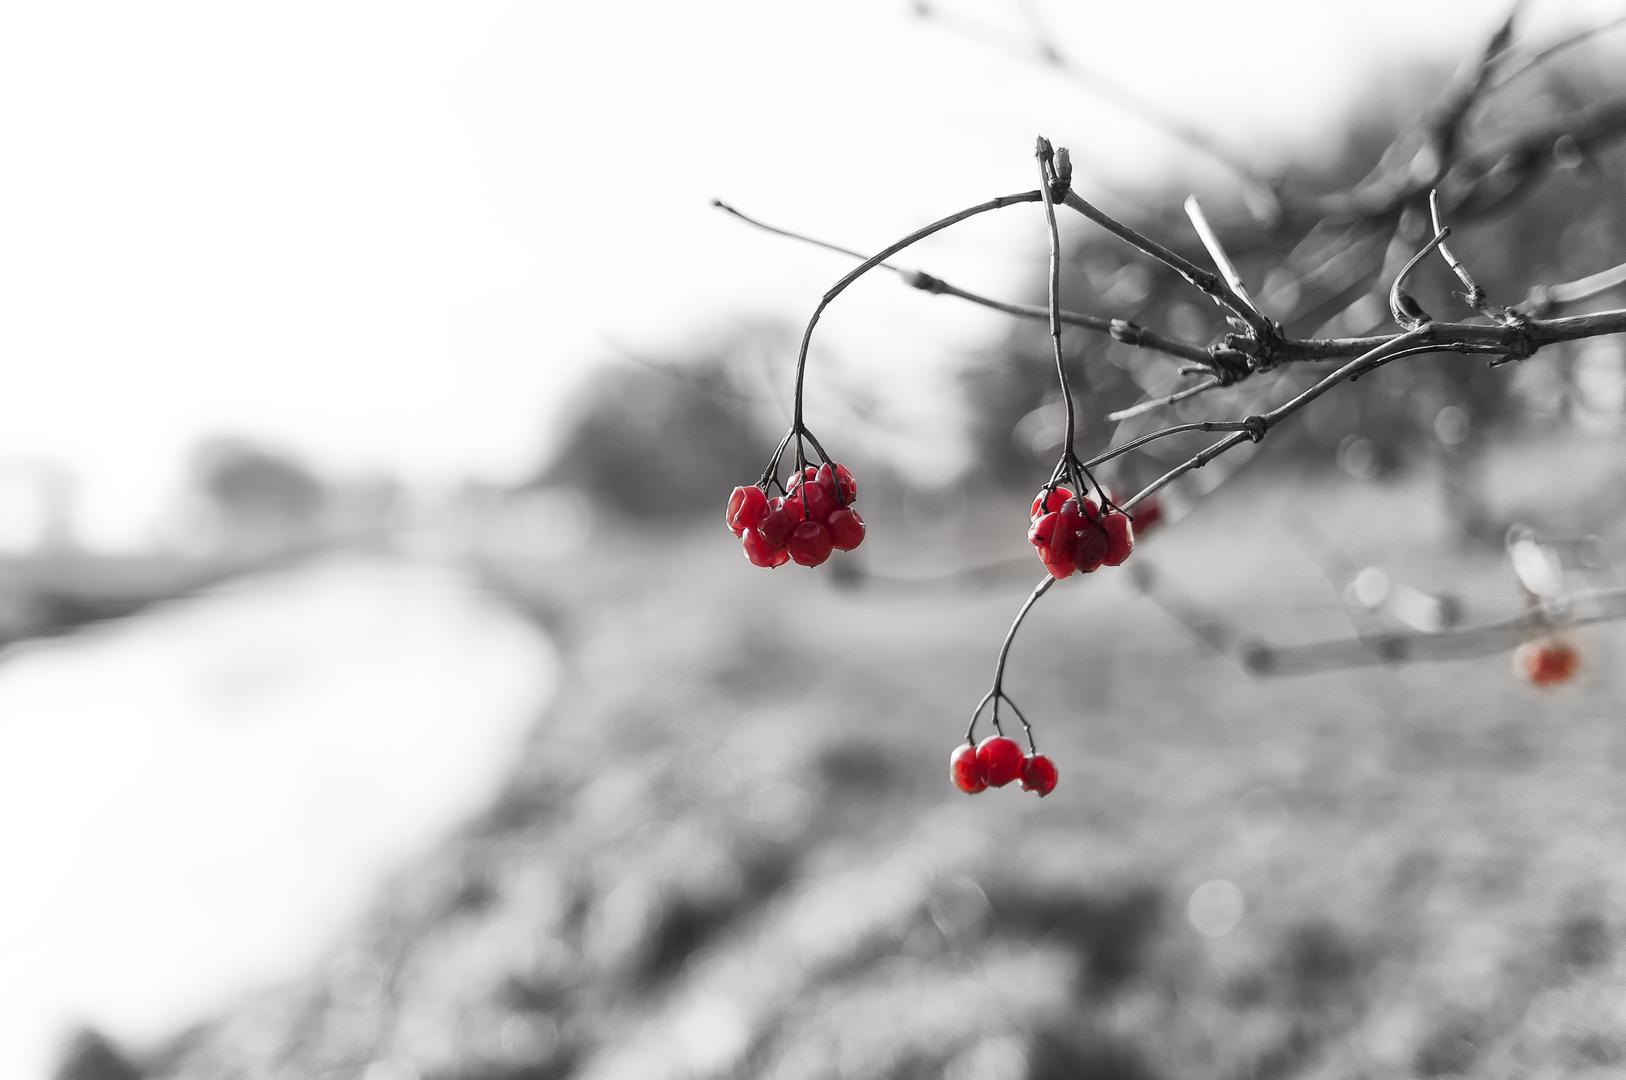 Der Winter geht, der Frühling kommt